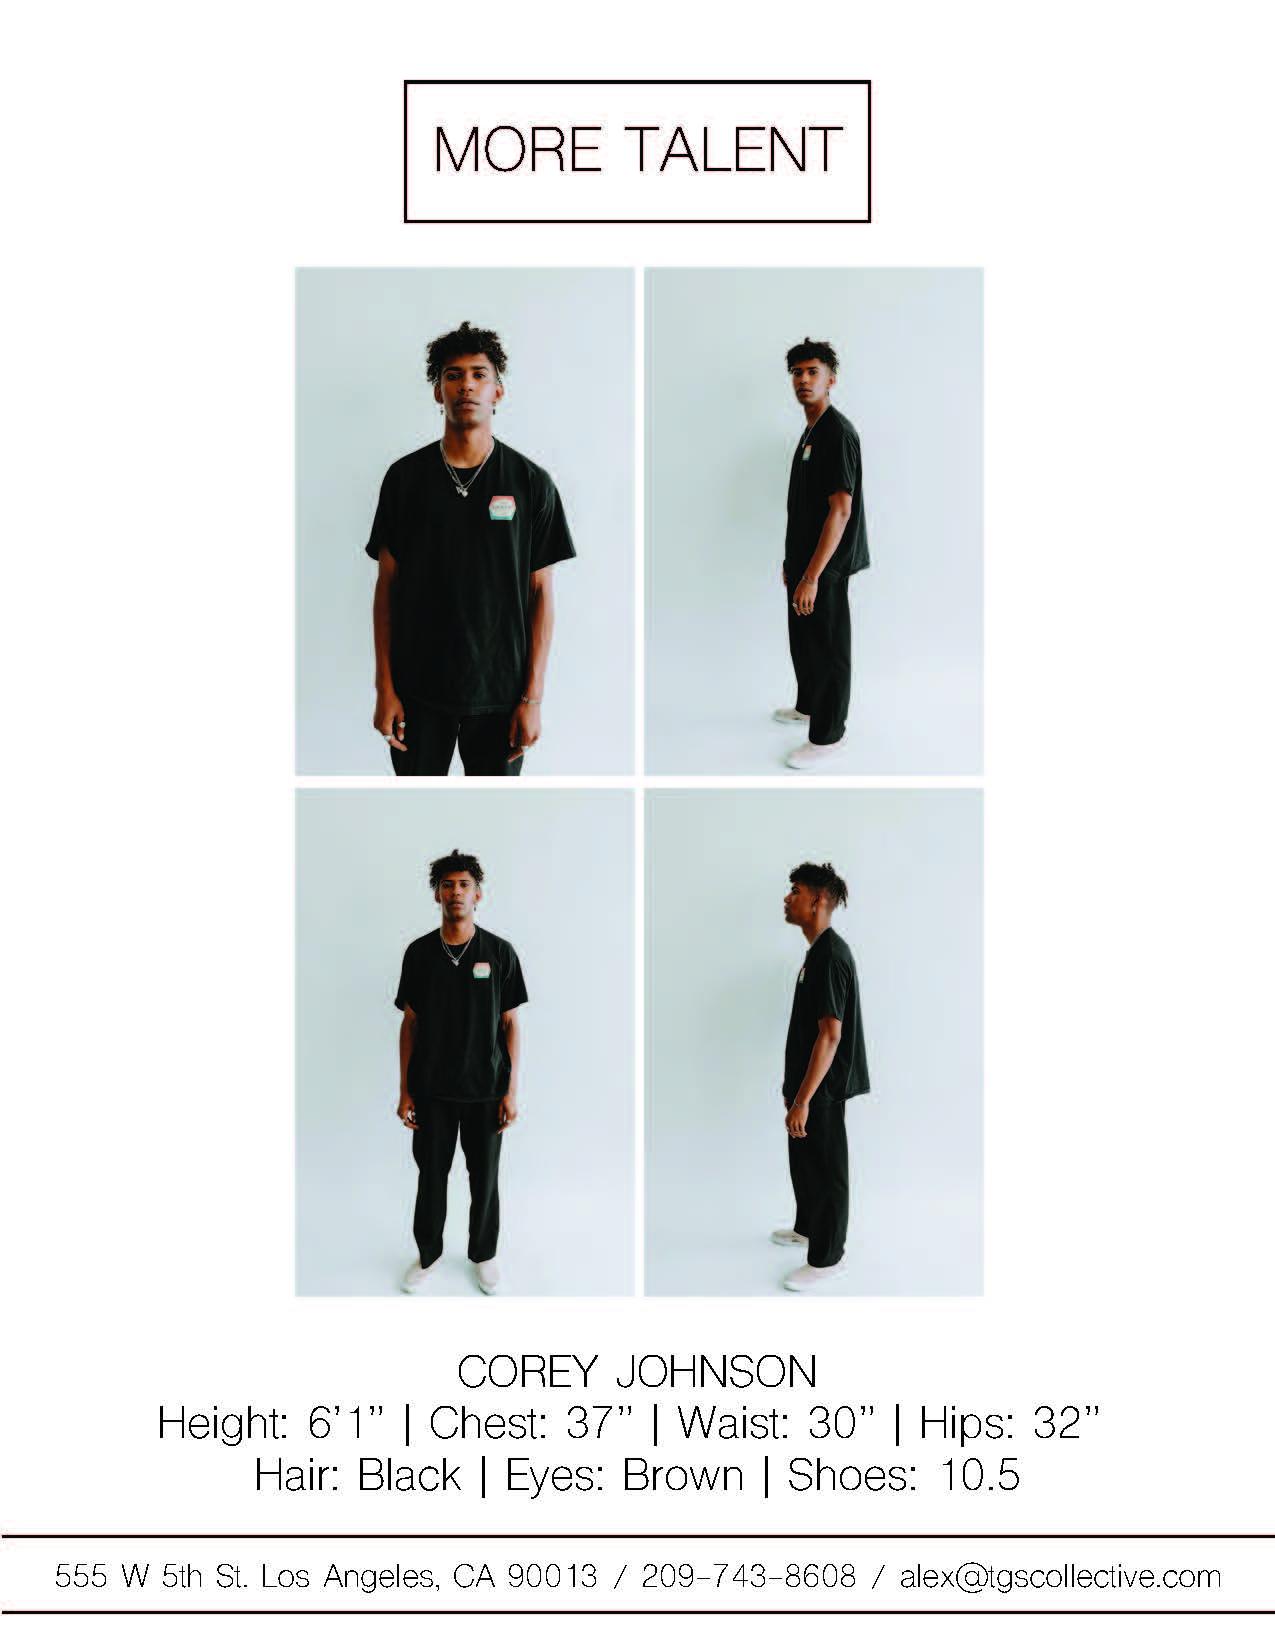 COREY JOHNSON MORE TALENT